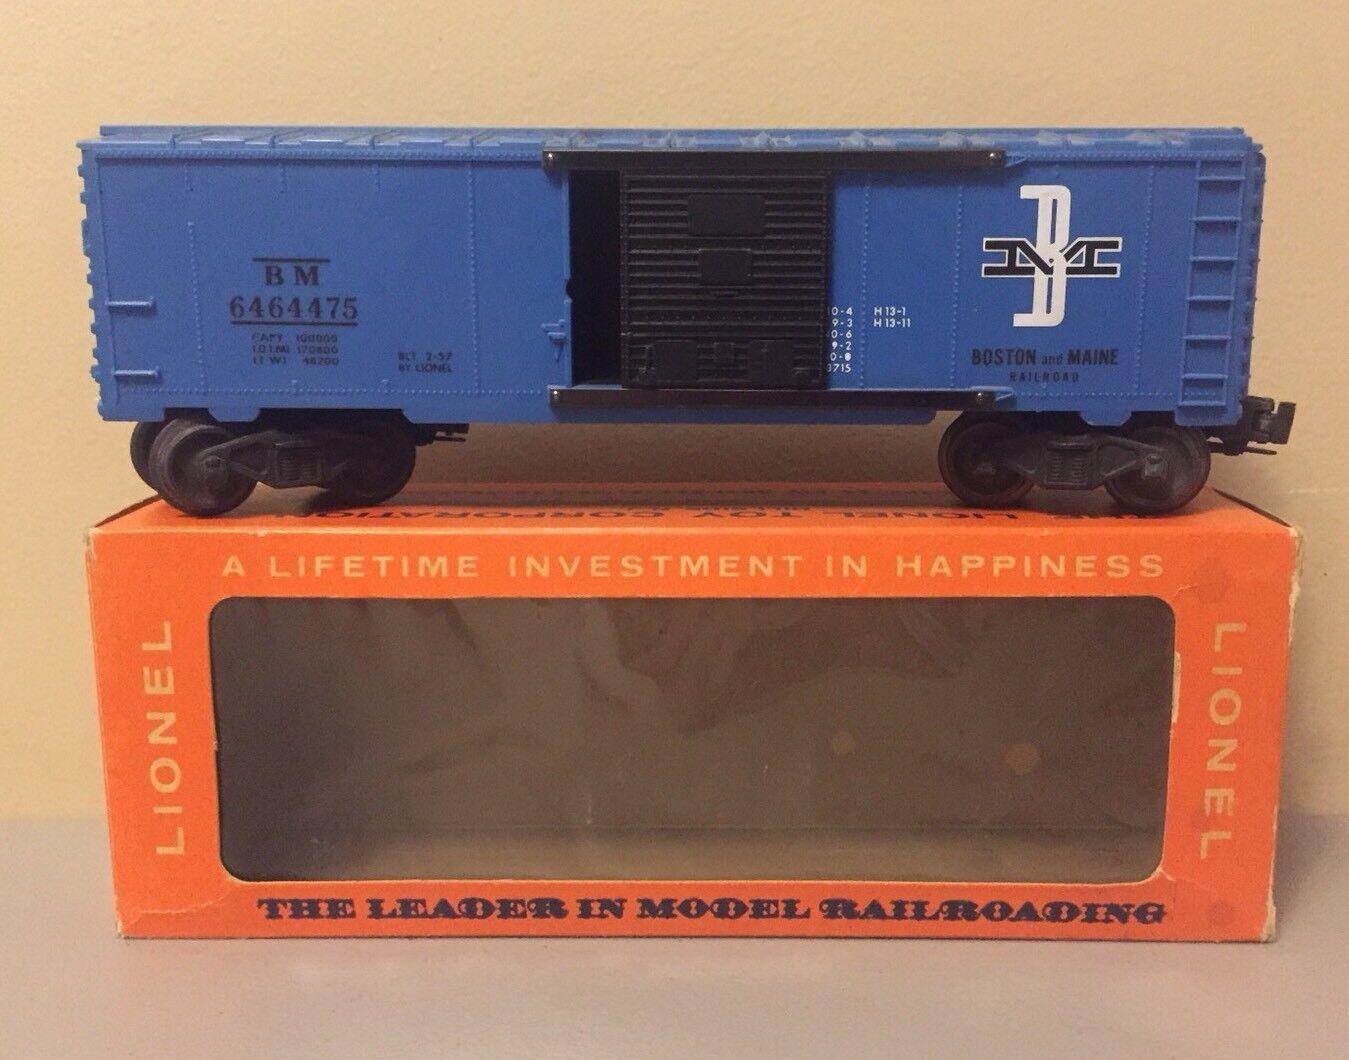 Lionel Trains Trains Trains O Scale Model Train 027 6464-475 Boston & Maine Boxcar Type IV 1b8415